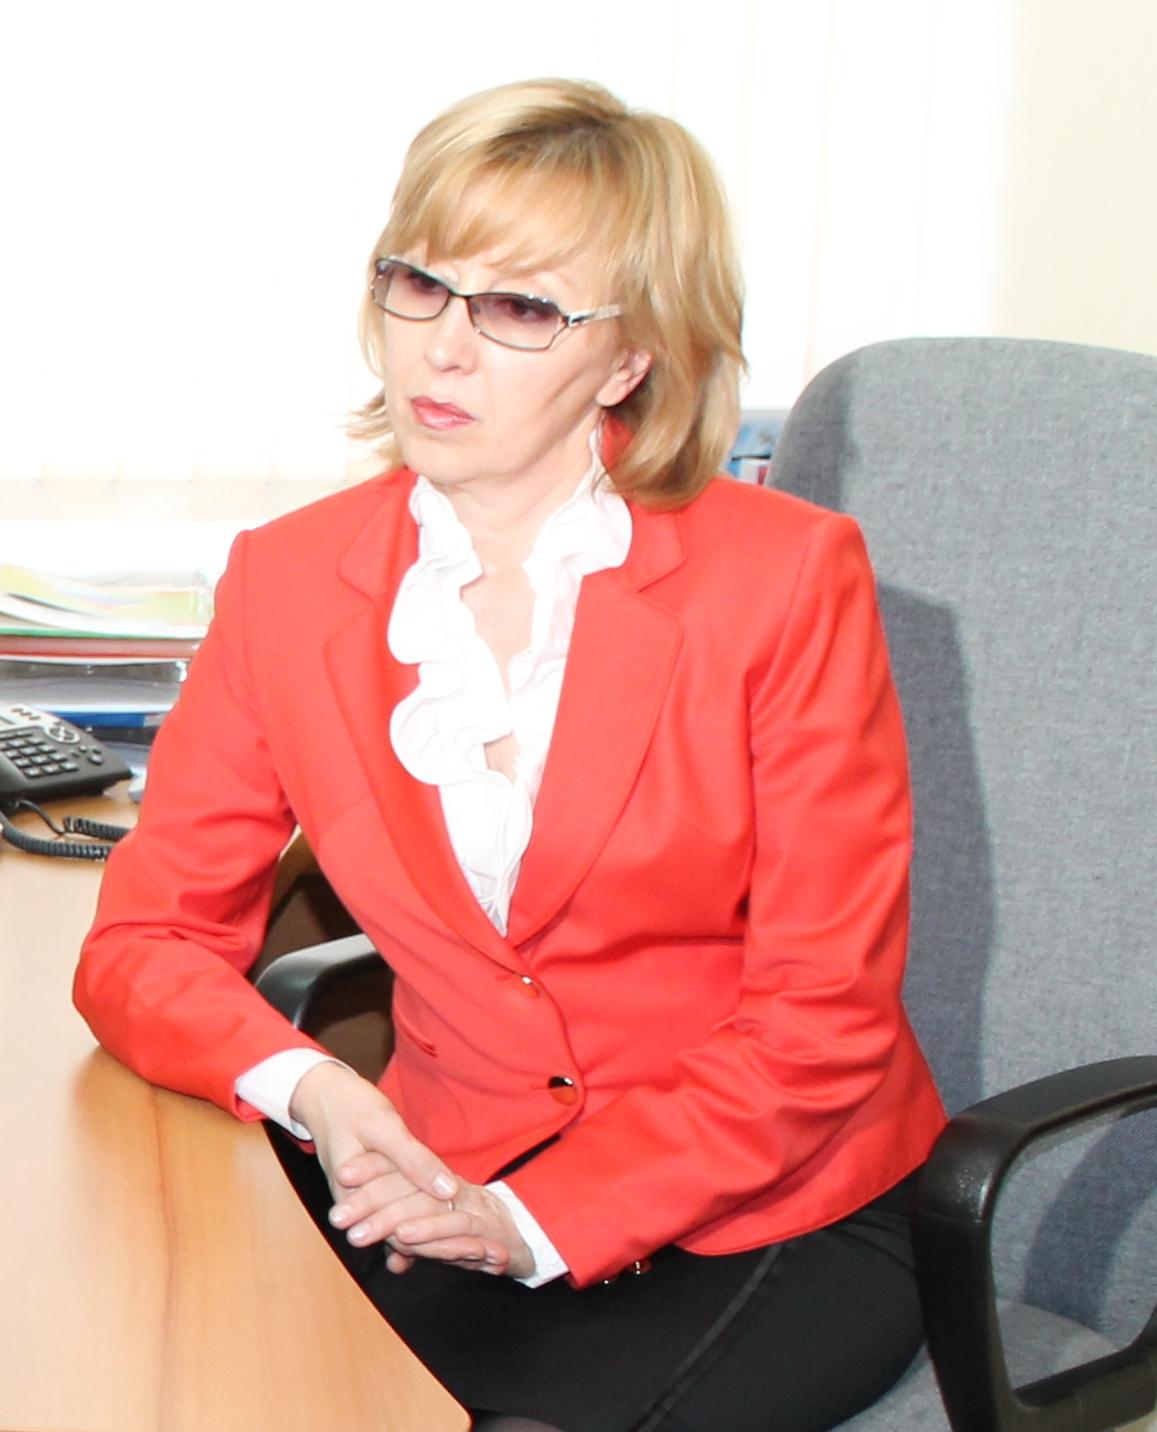 Ольга Авдеева. Фото ©День.org